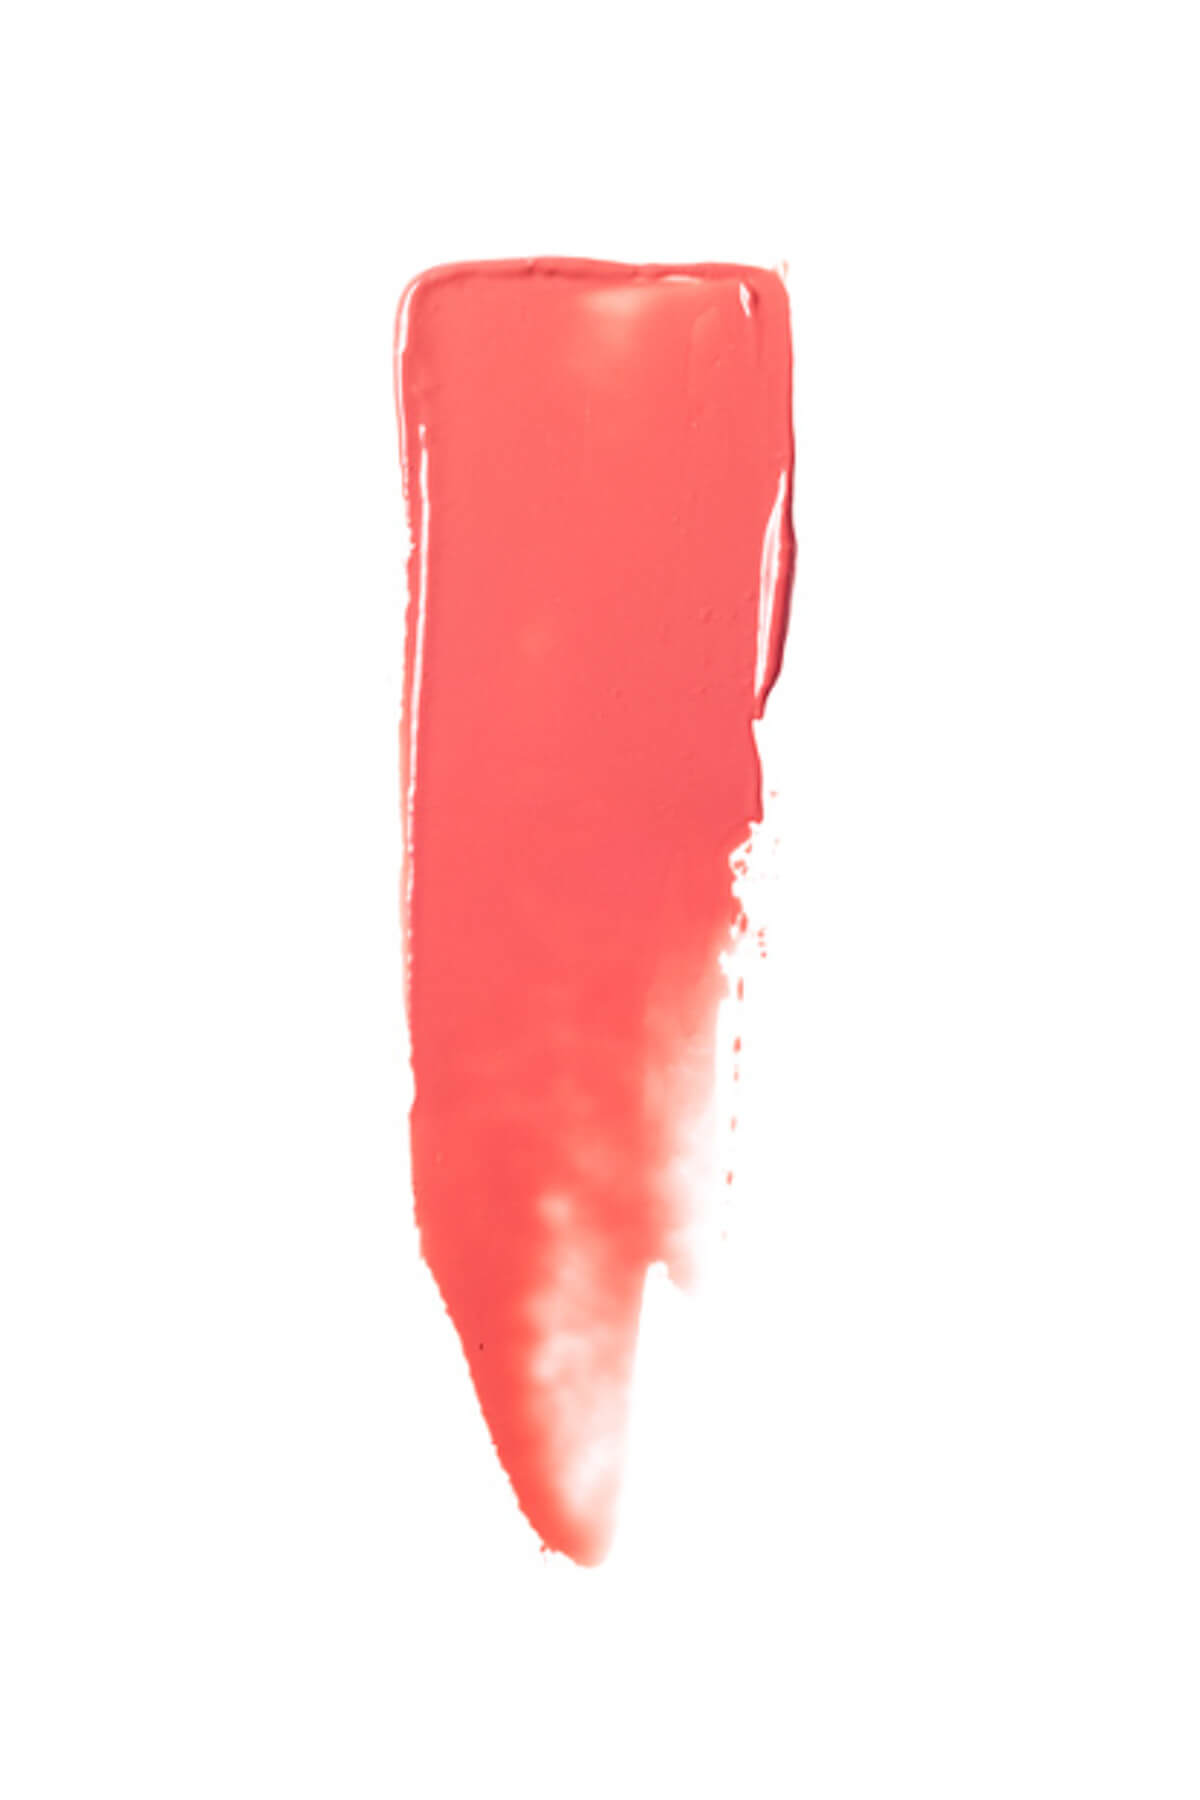 BOBBI BROWN Ruj - Nourishing Lip Color Coral Pink 2.3 g 716170192192 2